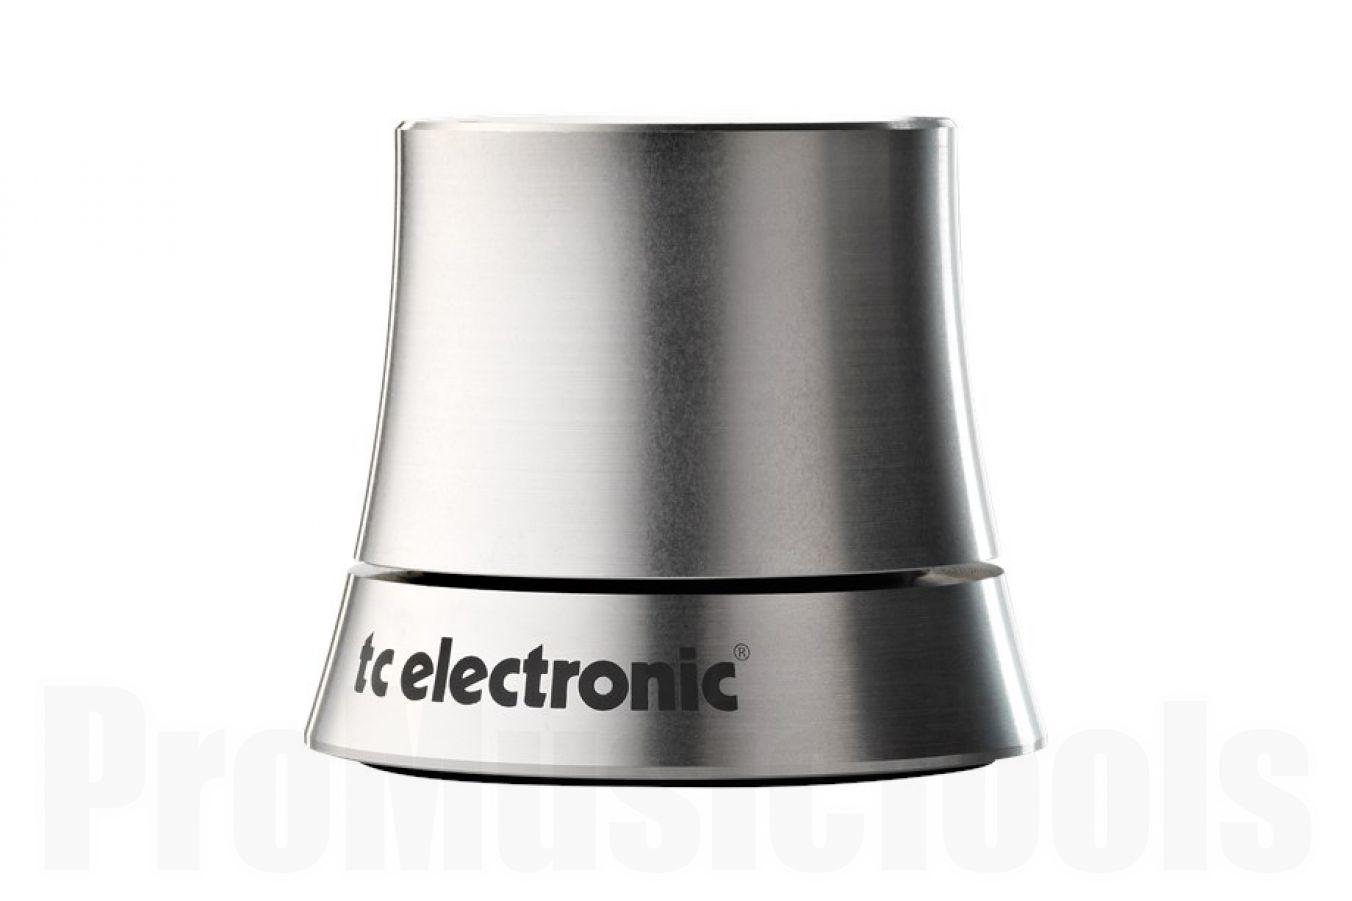 TC Electronic Level Pilot - b-stock (1x opened box)